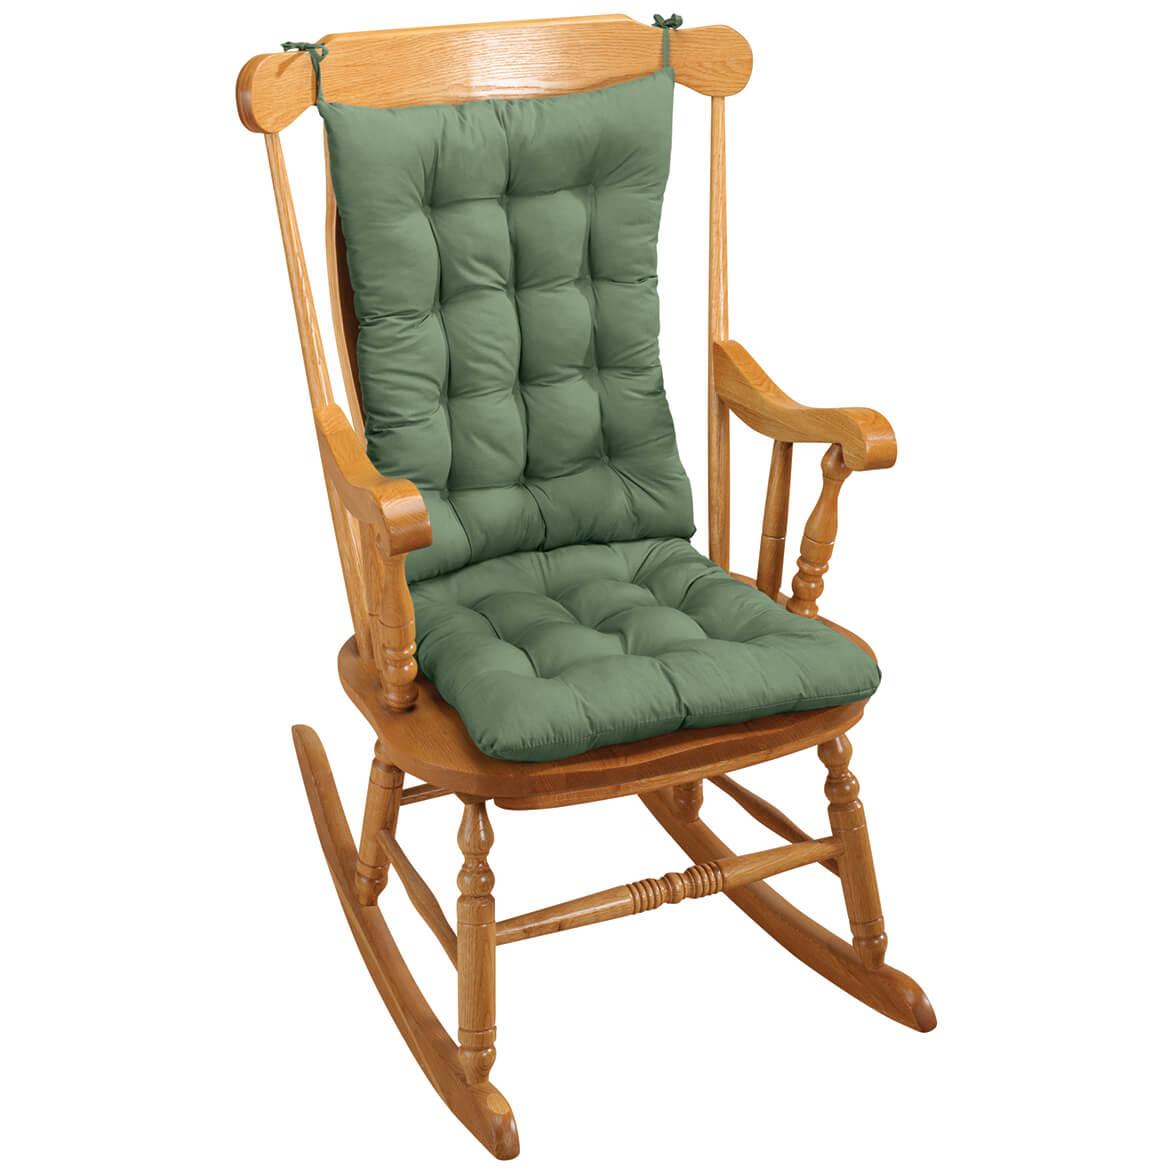 rocking chair pads walmart kits for sale and stool cushions miles kimball